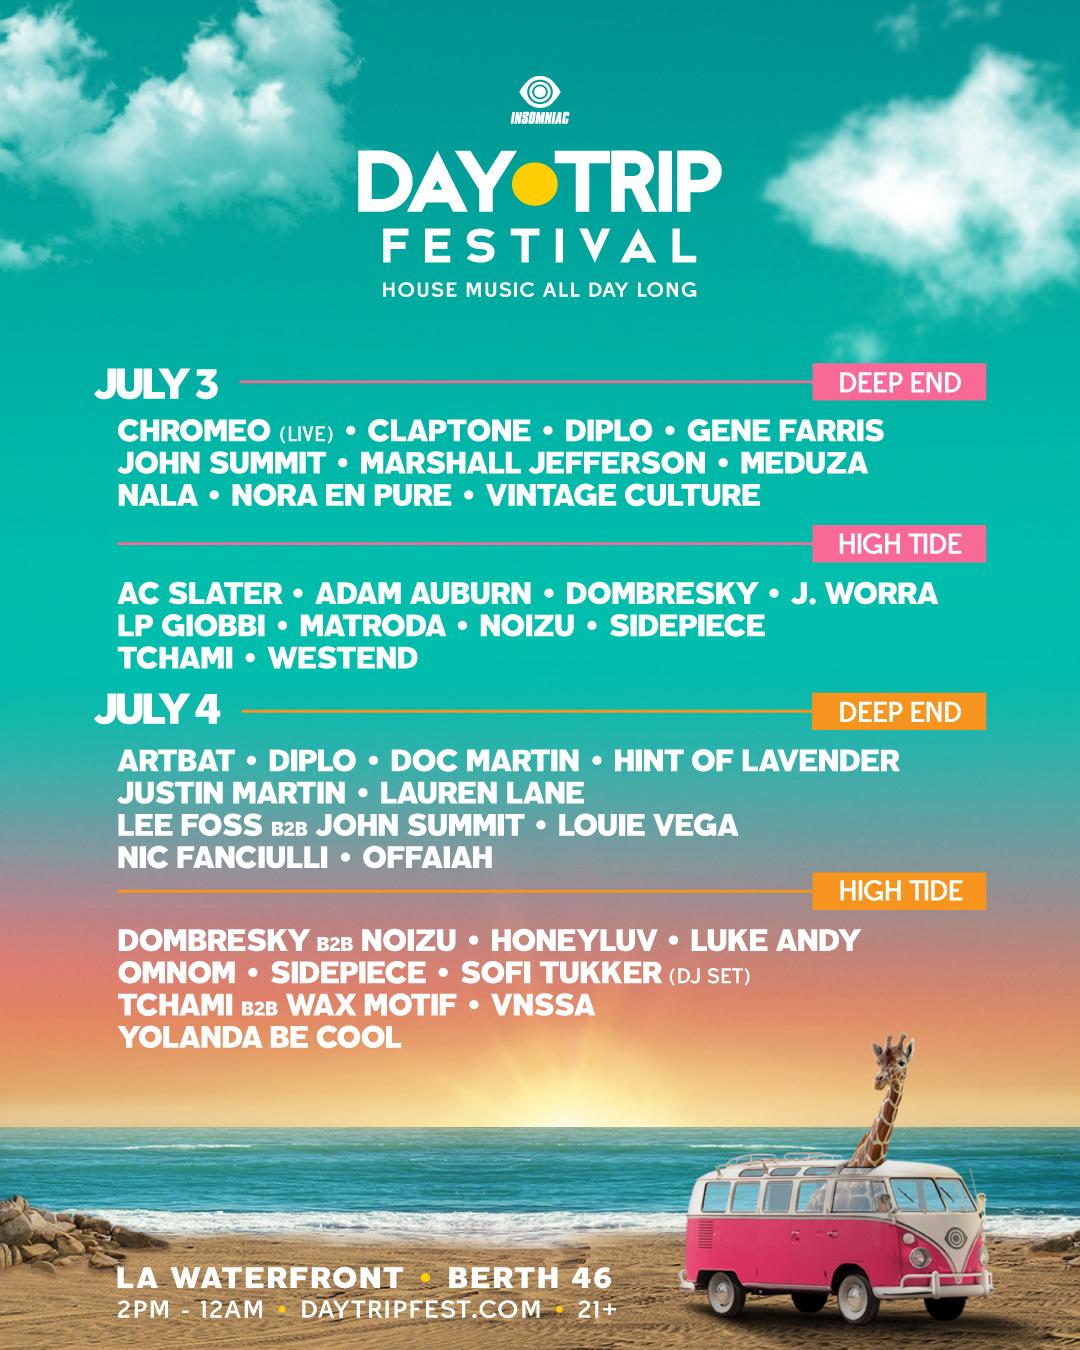 day trip festival lineup